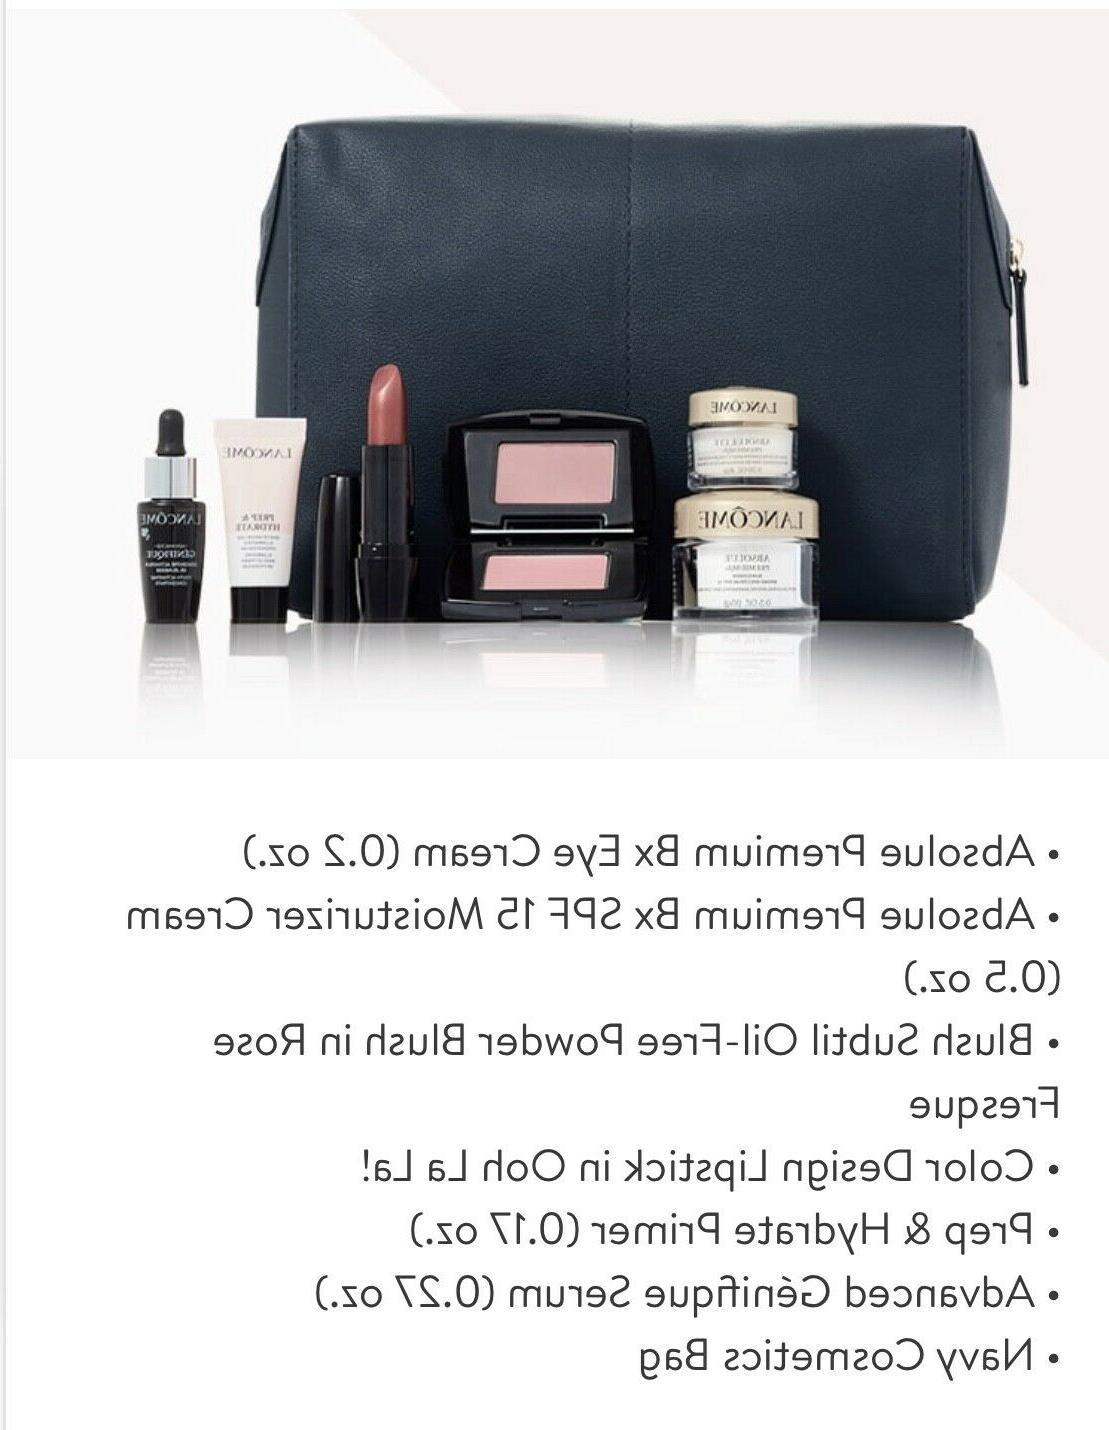 NEW LANCOME GWP~ Eye Cream, Moisturizer, Lipstick,